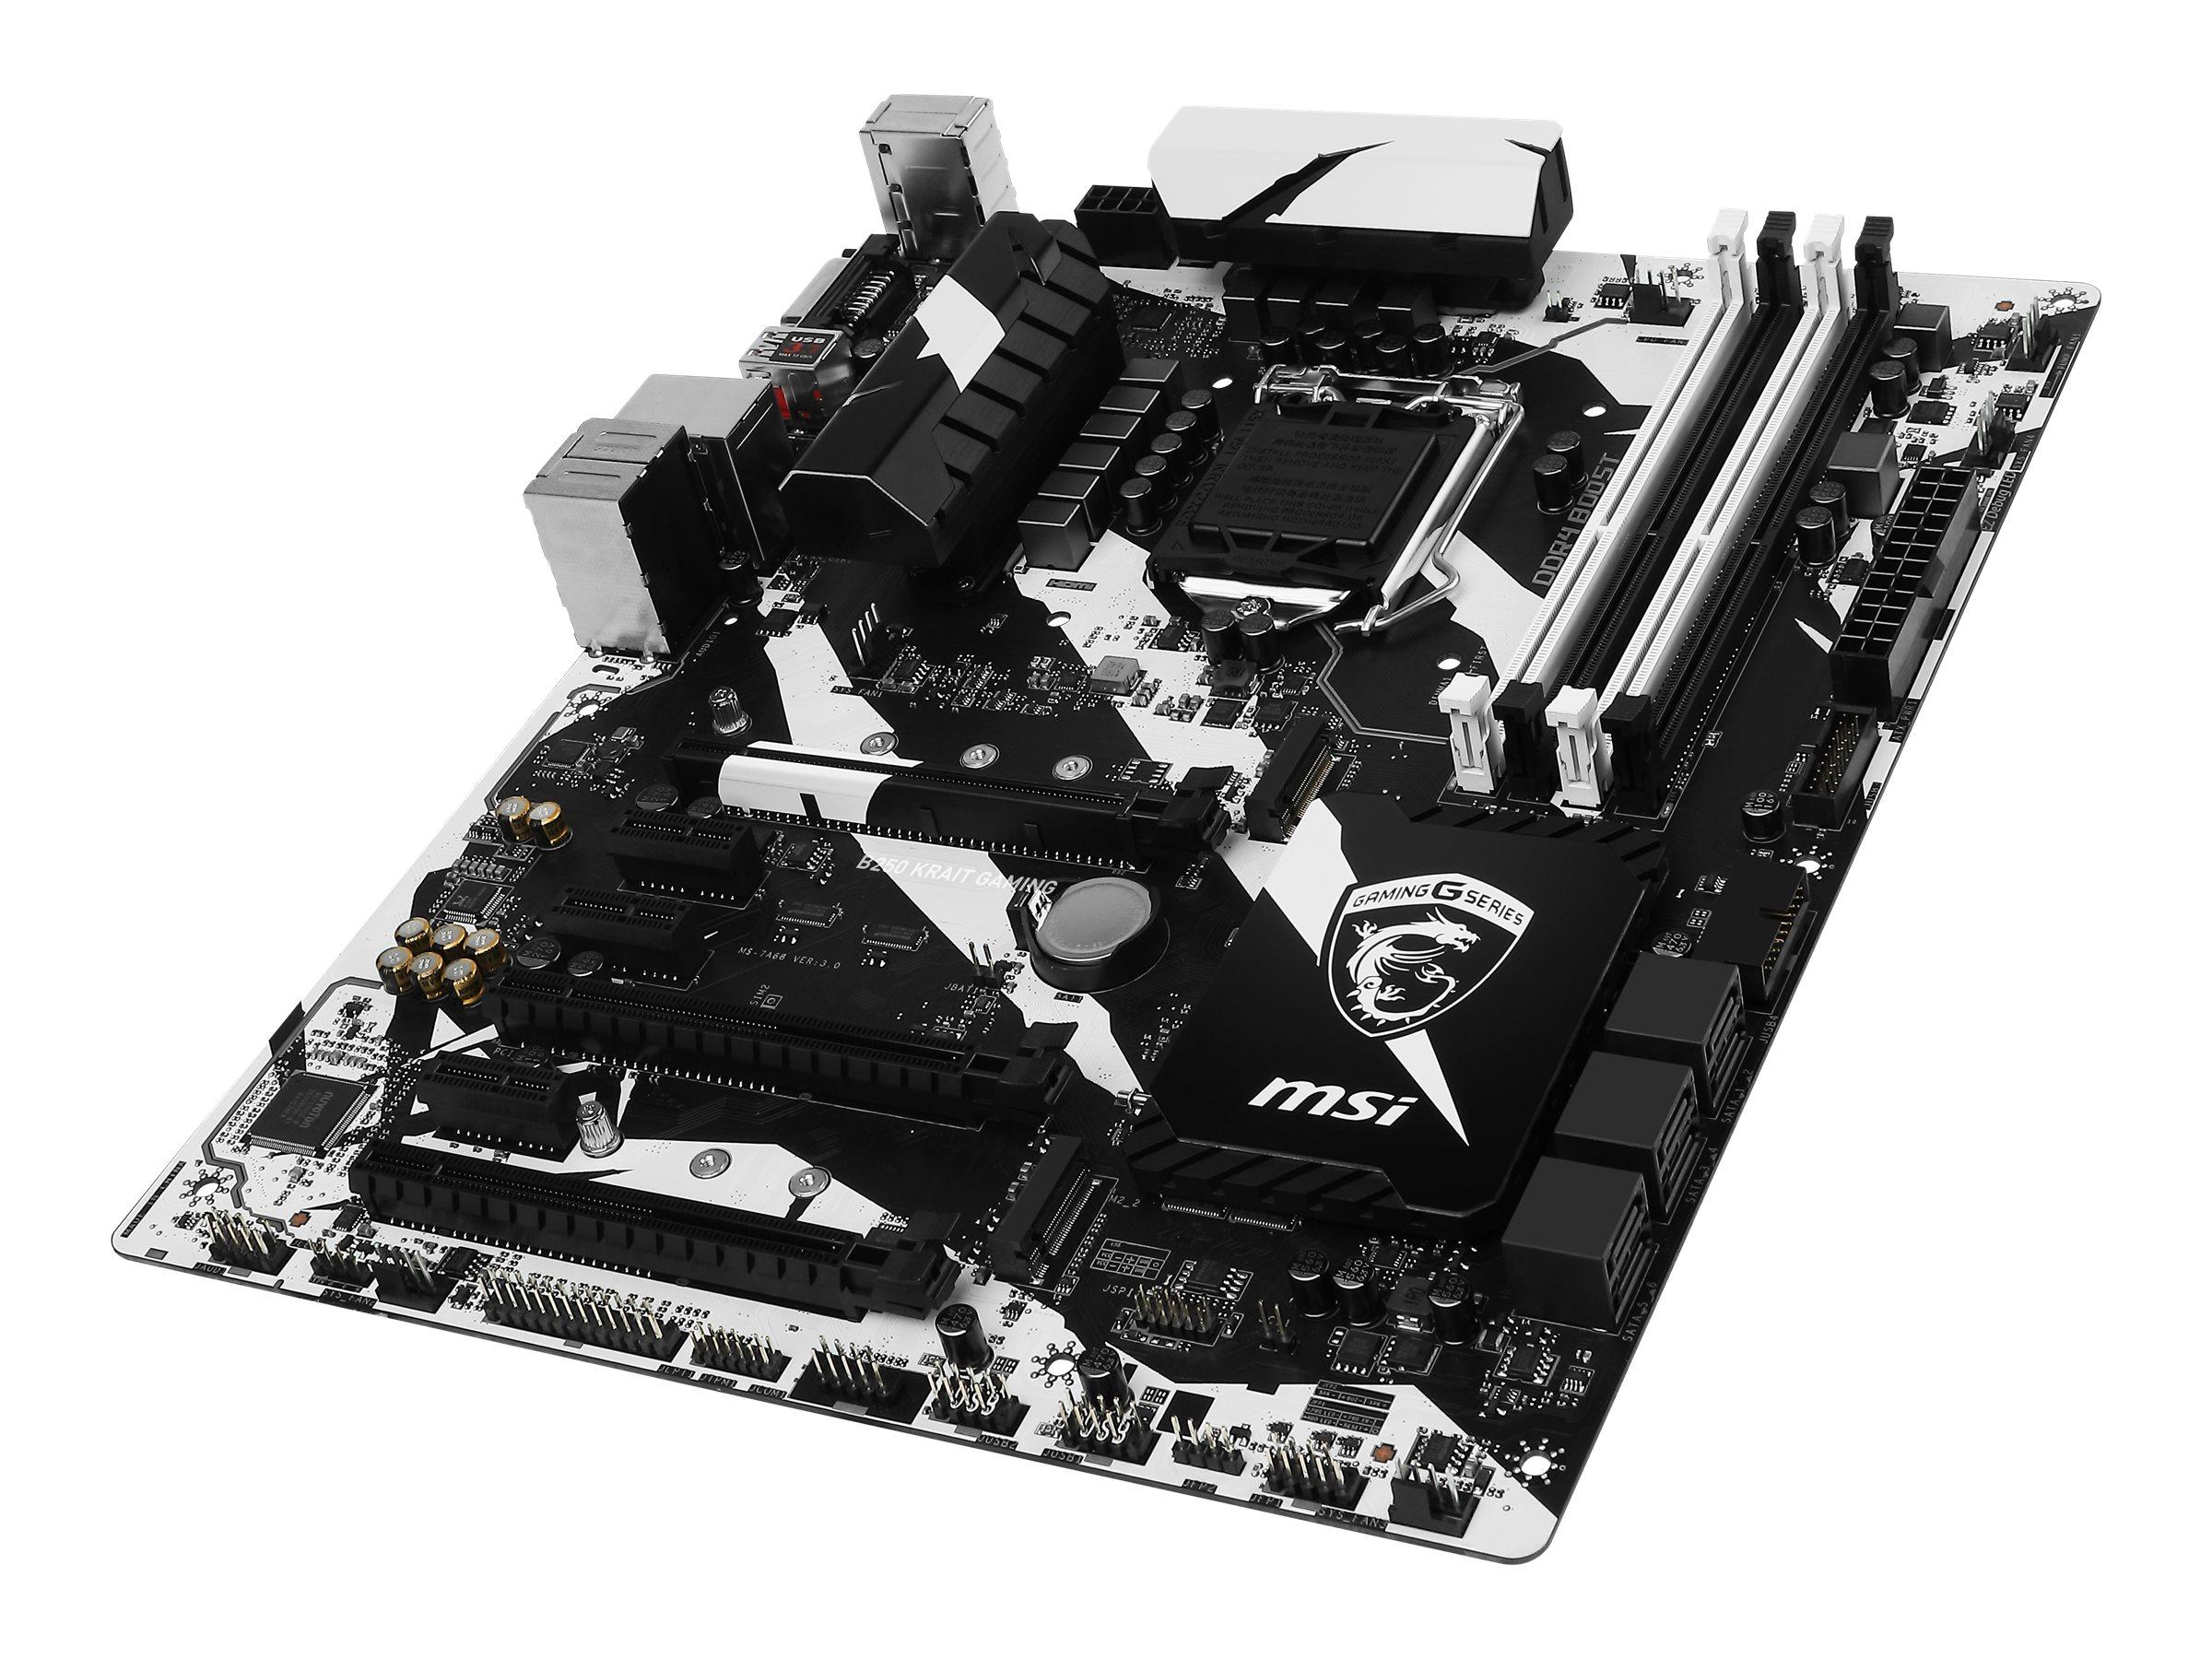 Microstar Motherboard, B250 Krait Gaming, B250 KRAIT GAMING, 33561381, Motherboards